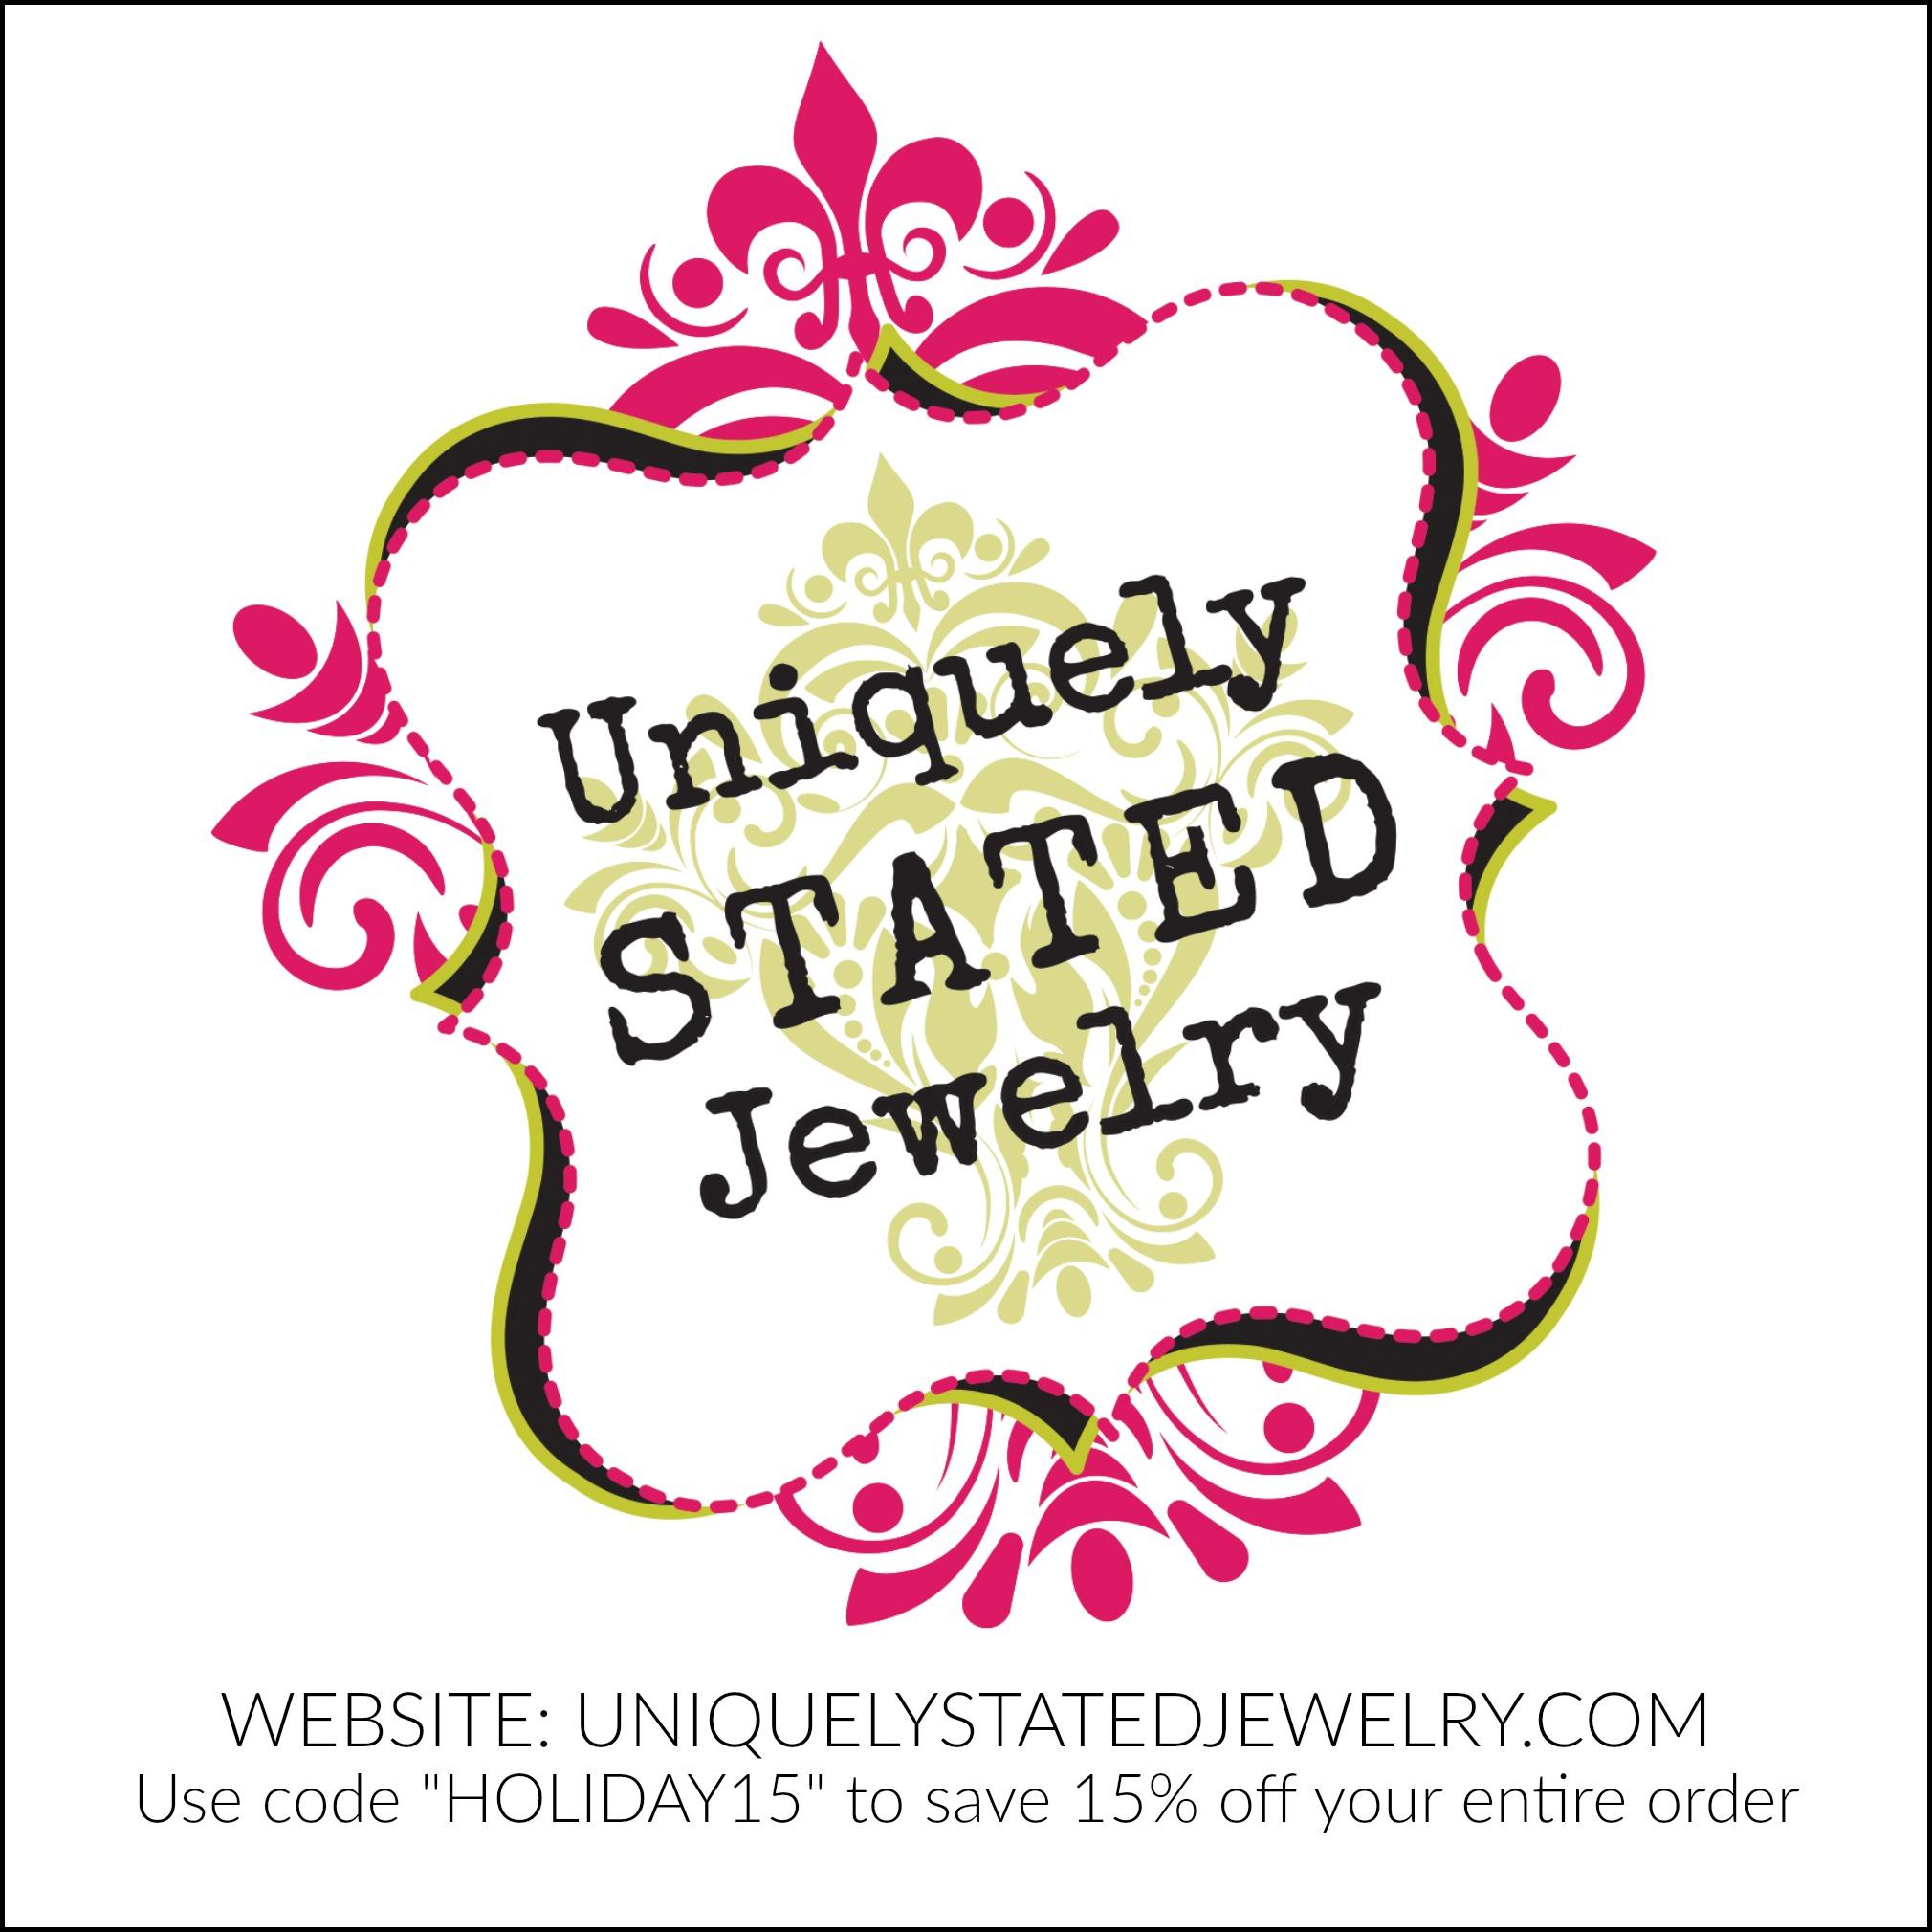 Uniquely Stated Jewelry | UNIQUELYSTATEDJEWELRY.COM